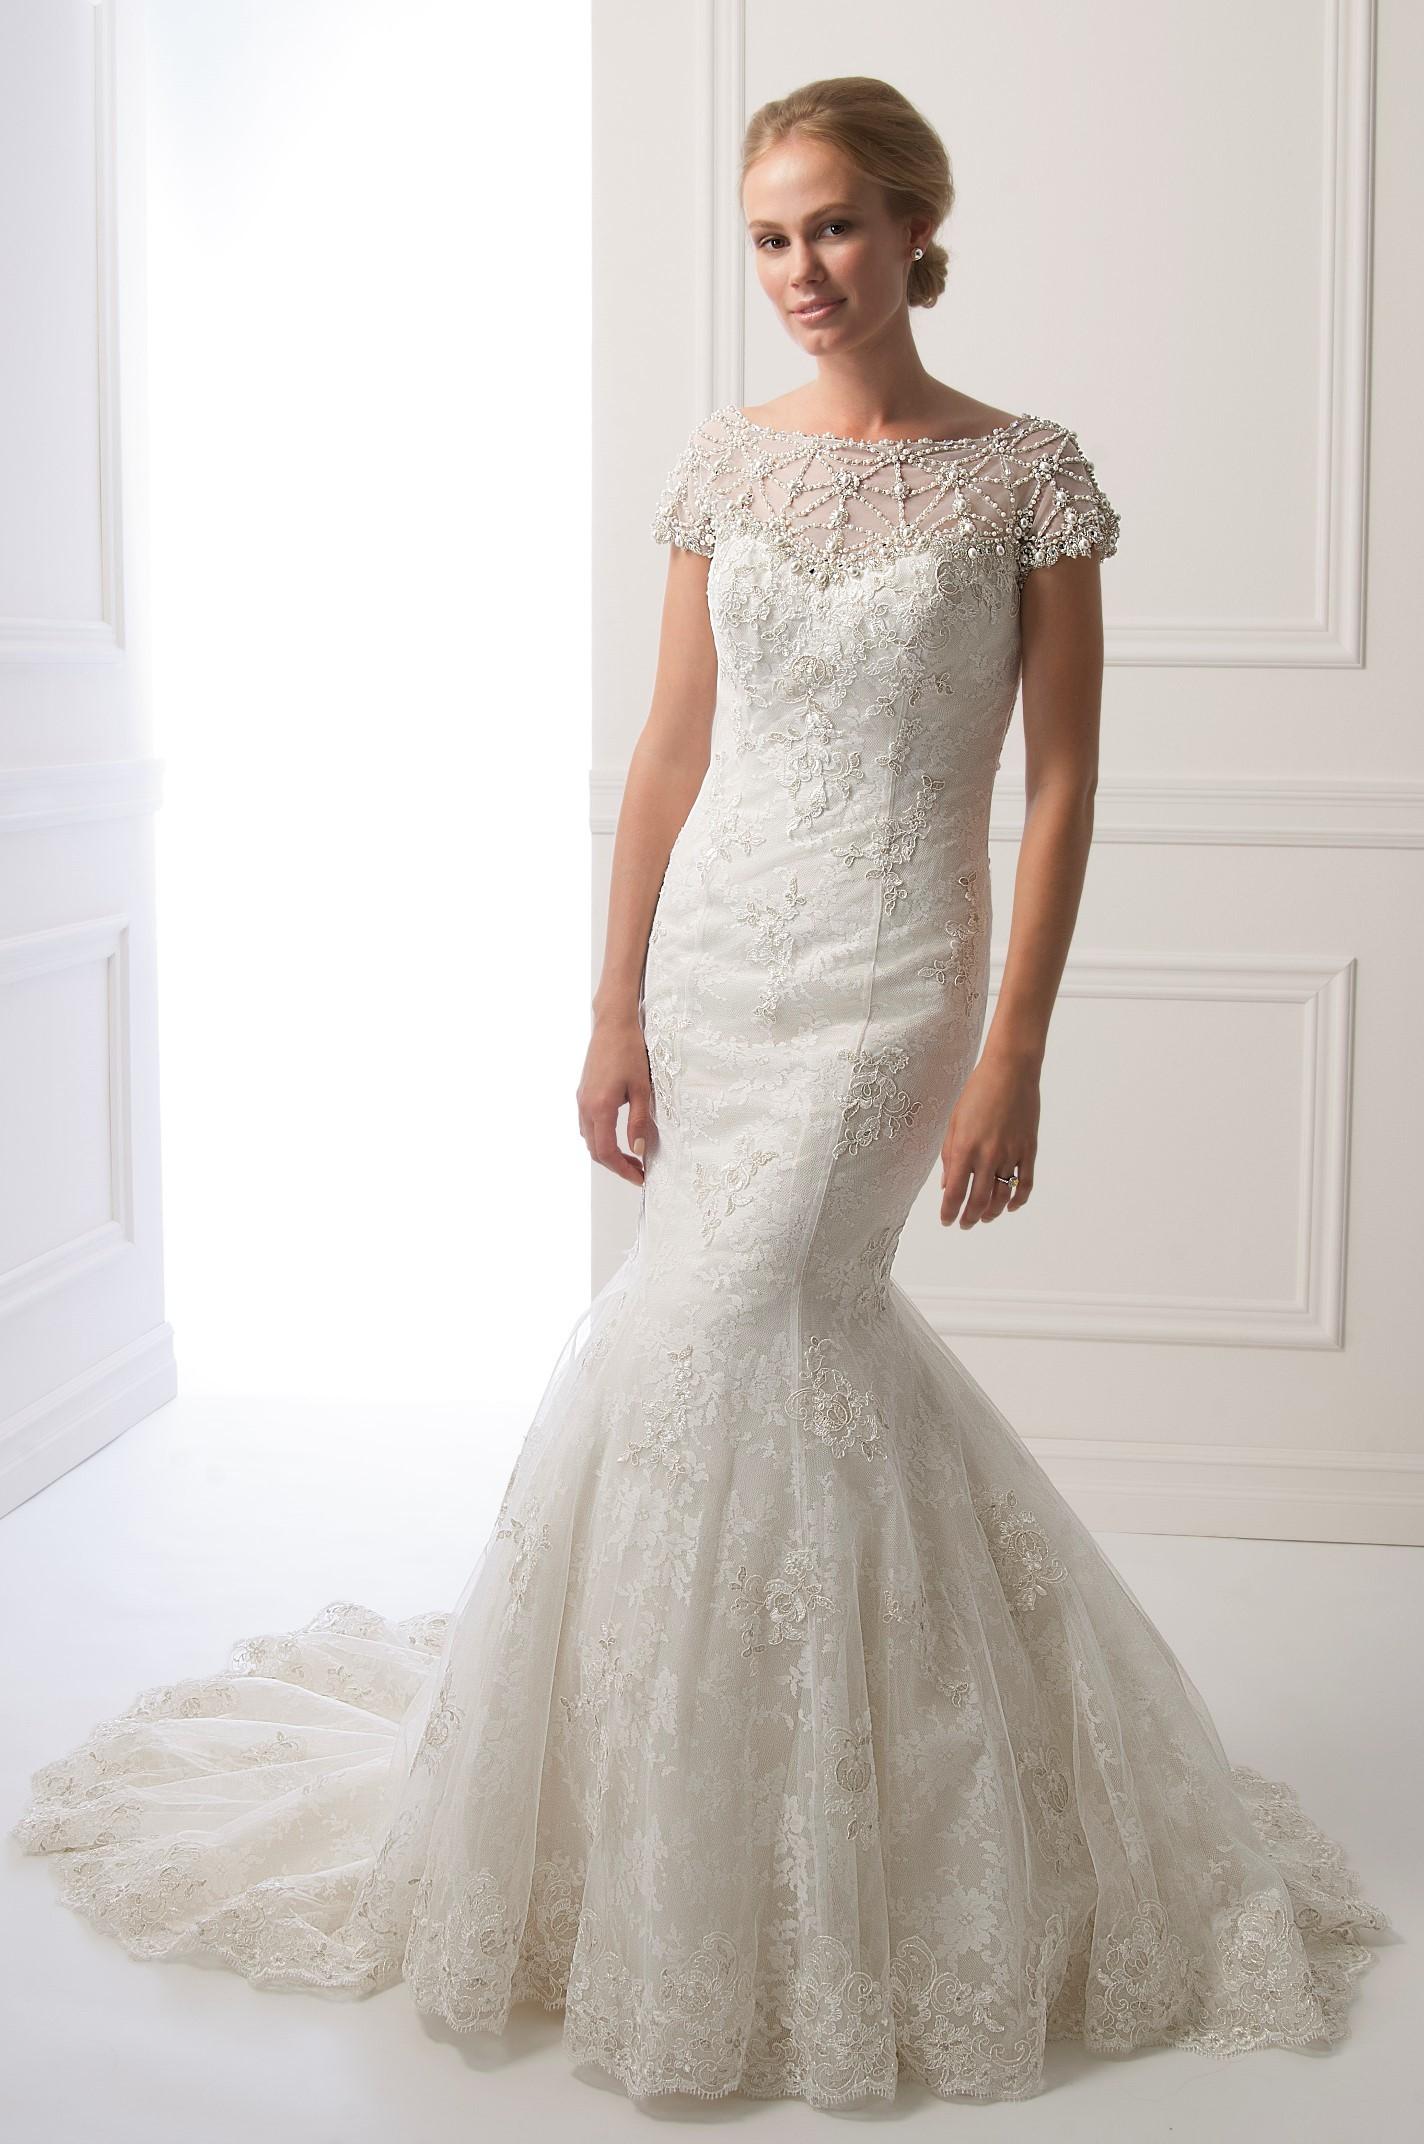 Dress alfred sung fall 2013 bridal 6928 alfredsung bridal alfred sung fall 2013 bridal 6928 ombrellifo Choice Image